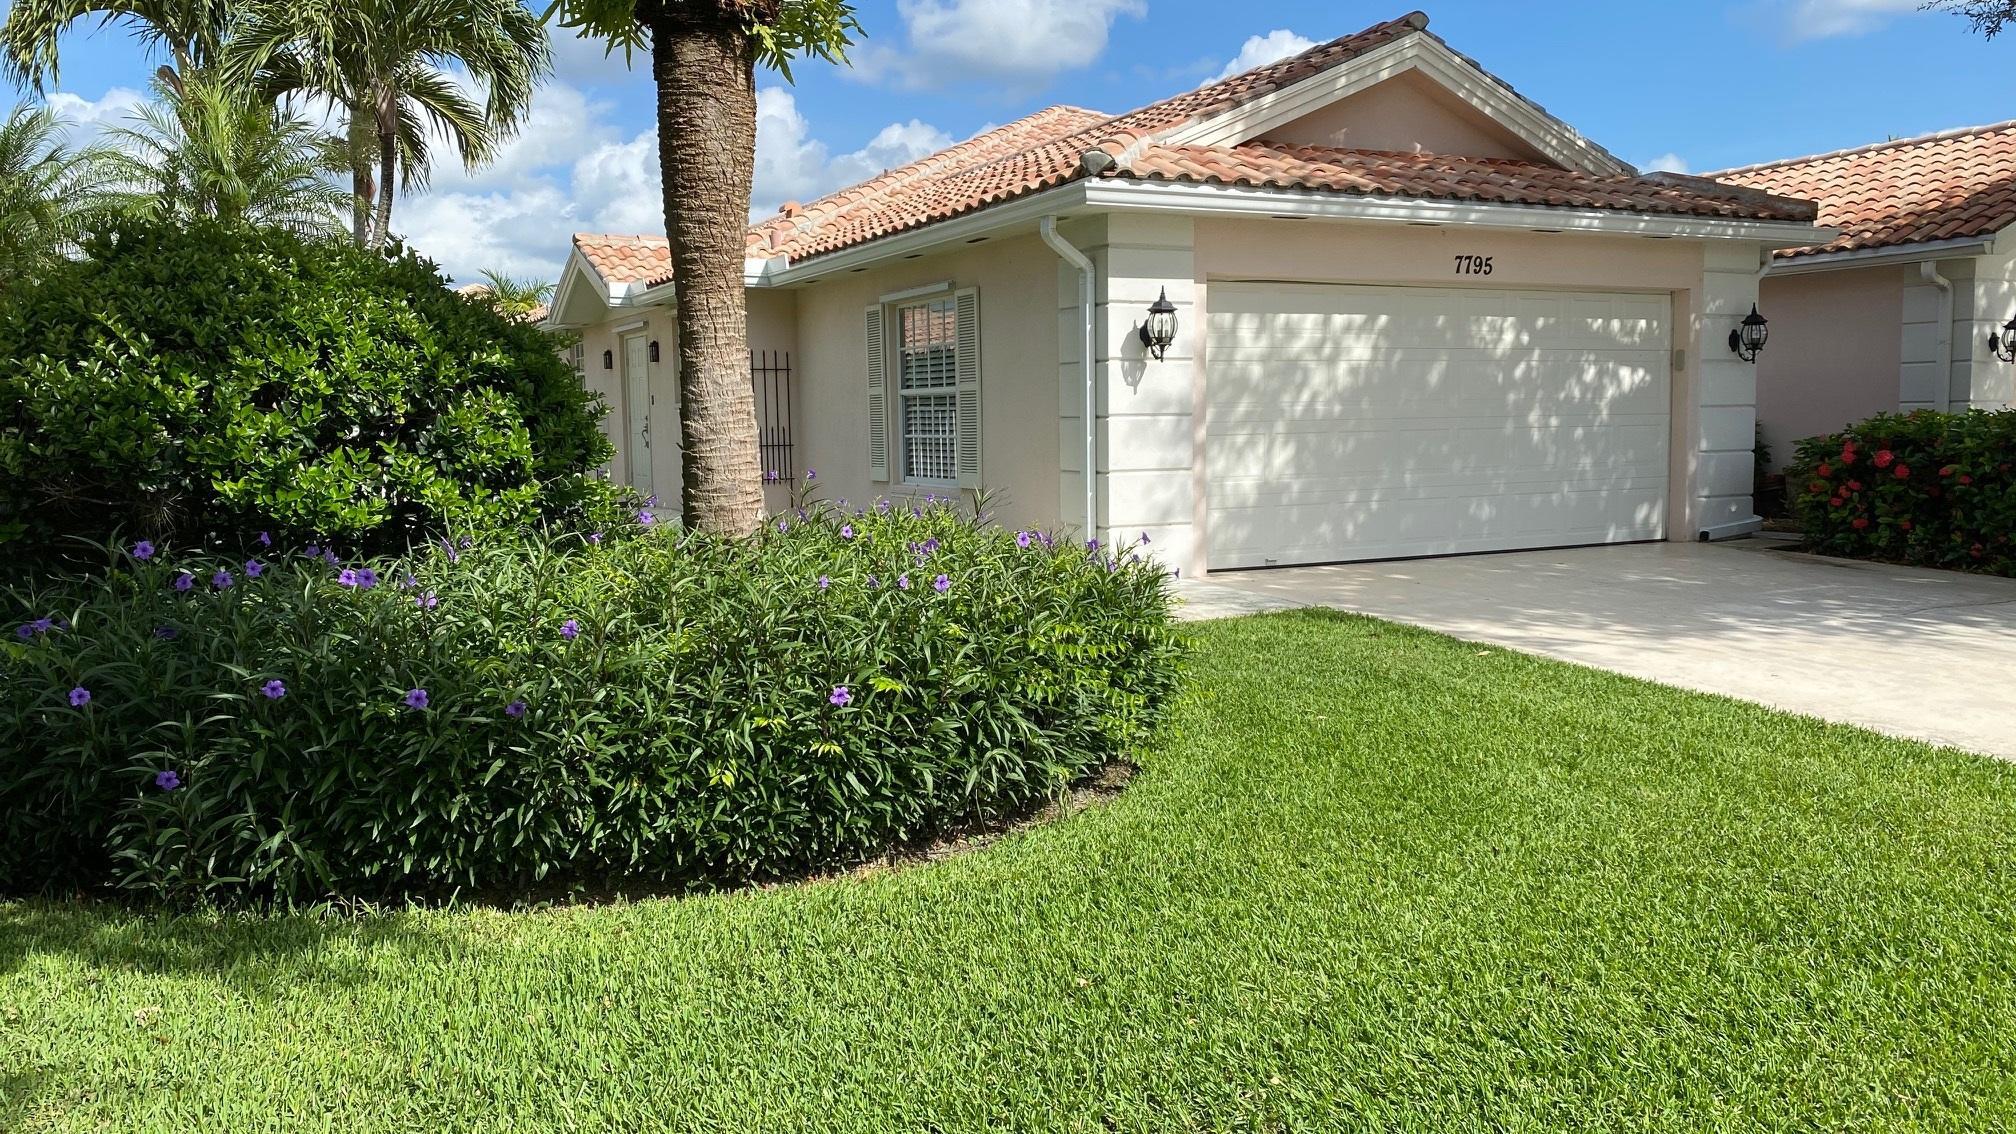 7795 Nile River Road  West Palm Beach, FL 33411